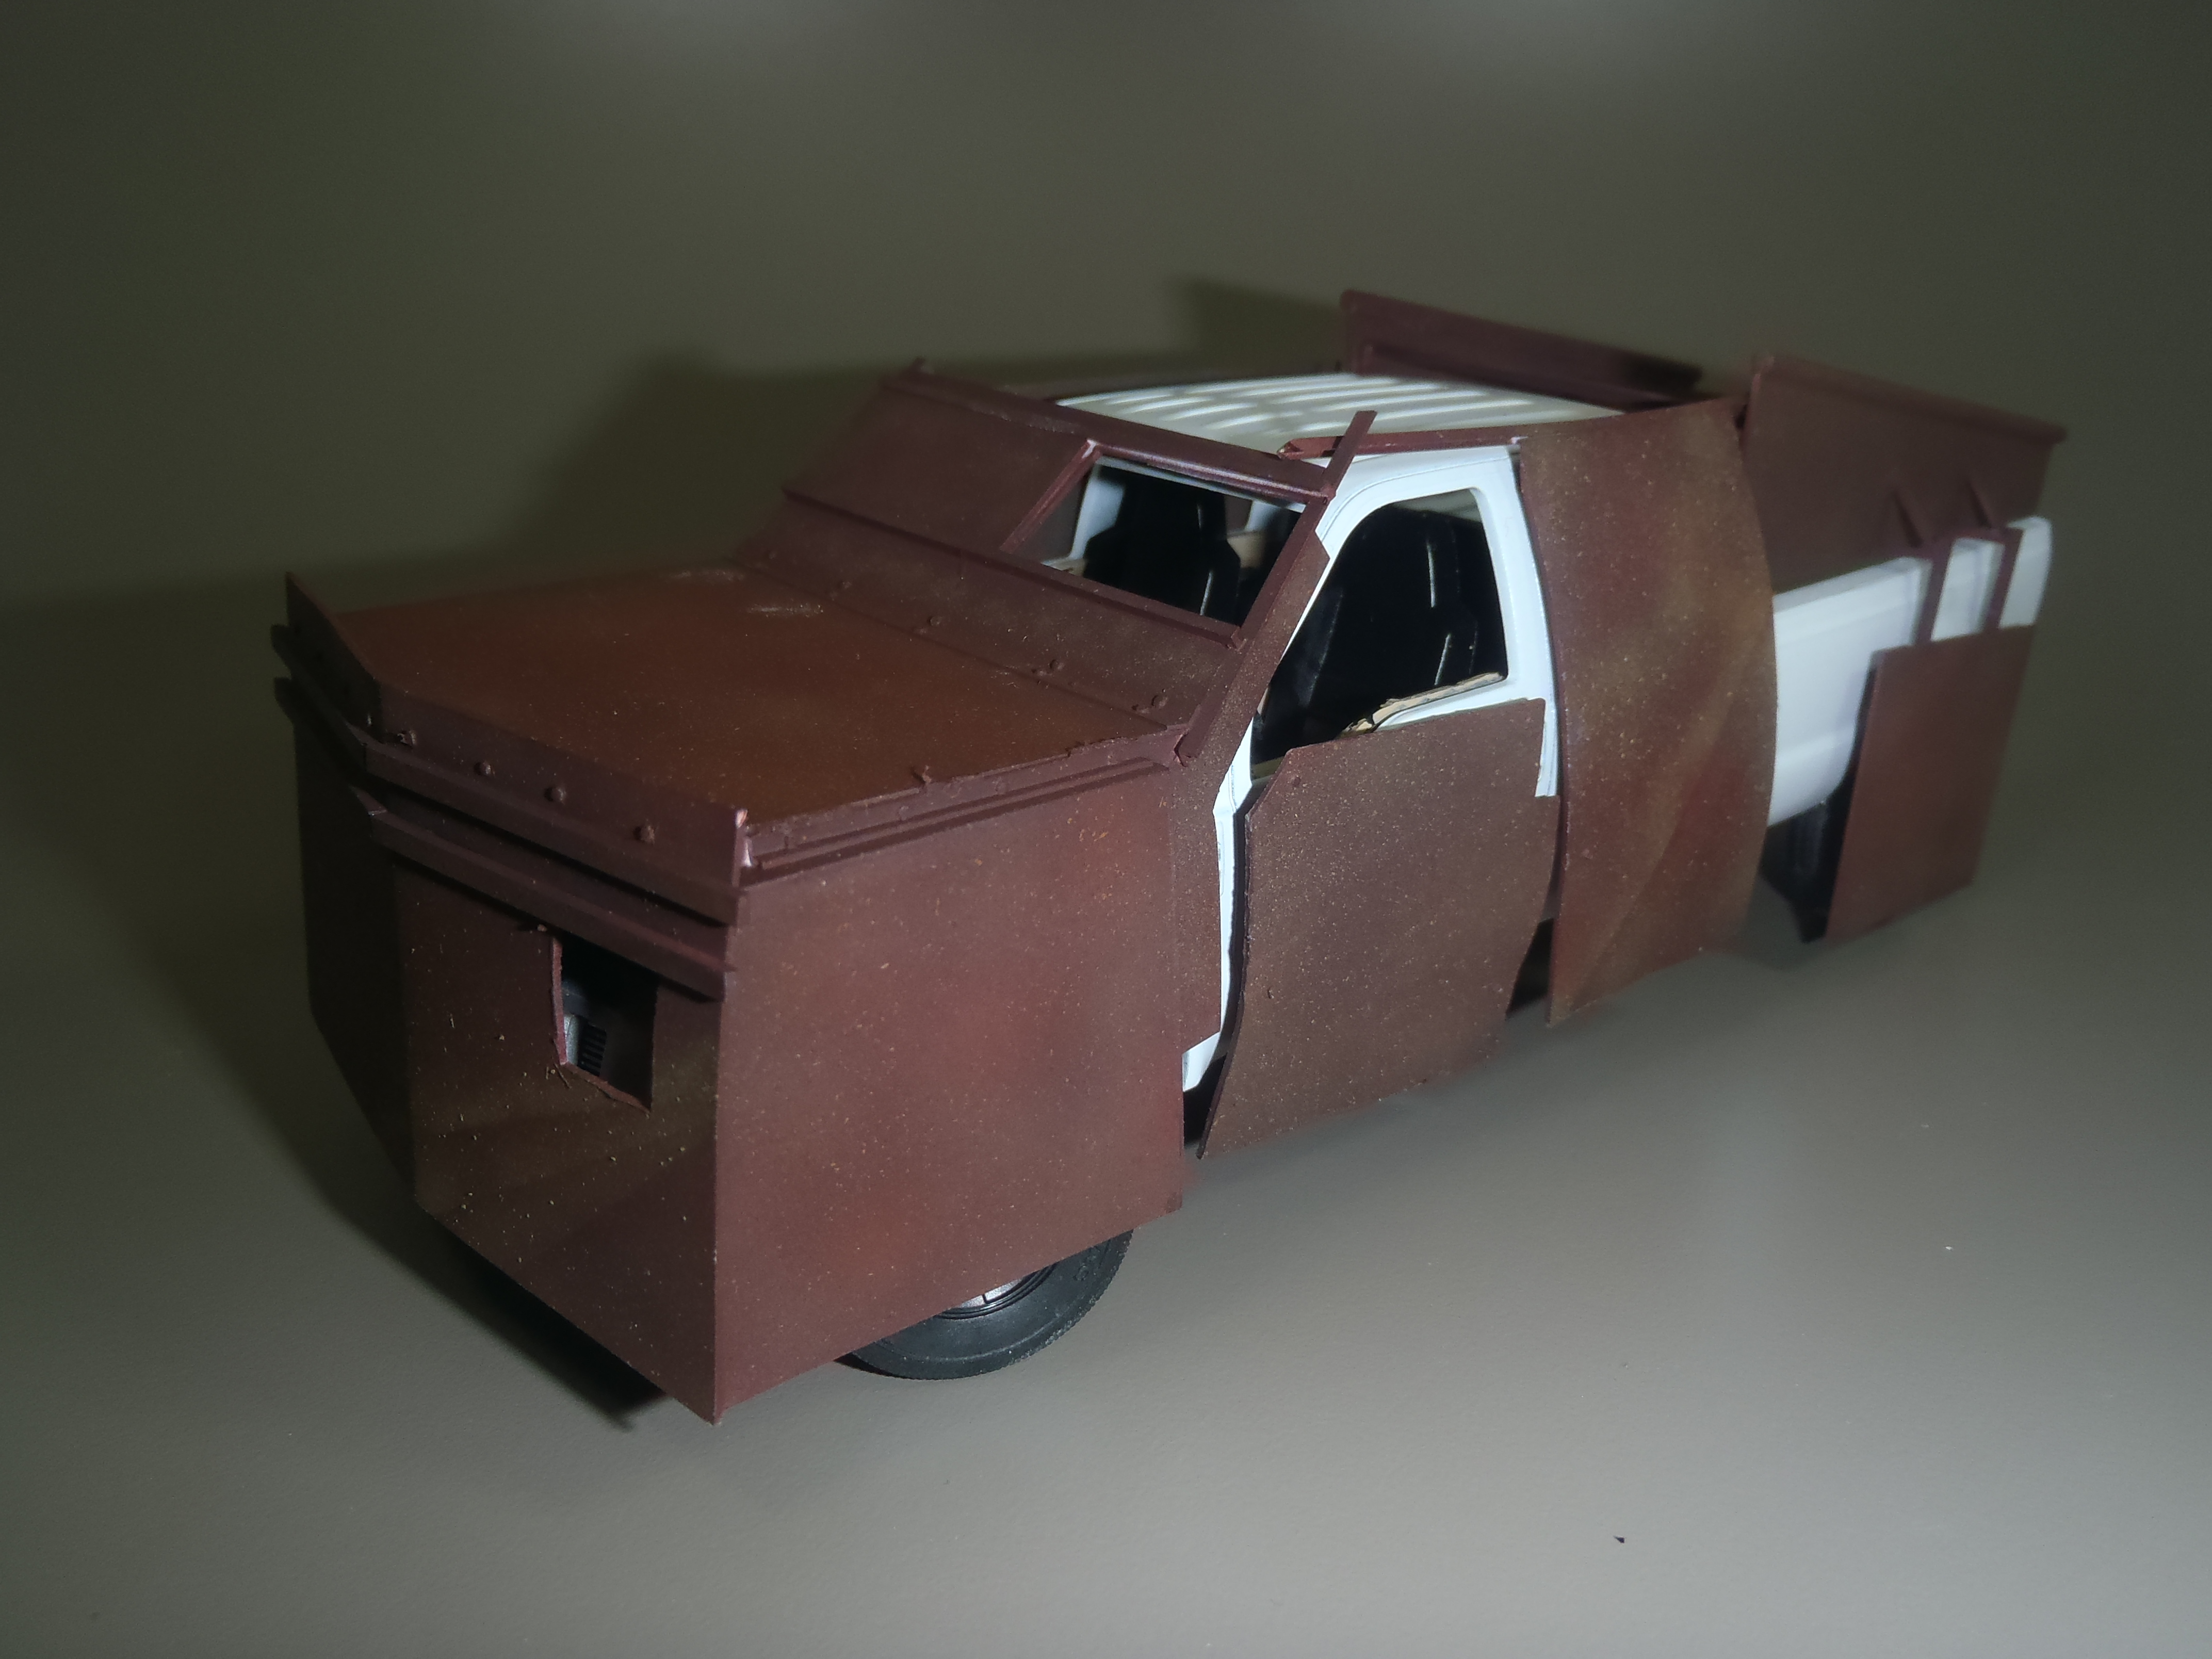 Pickup F 350 (Meng) au 1/35 - Page 2 16111509535615742614639661